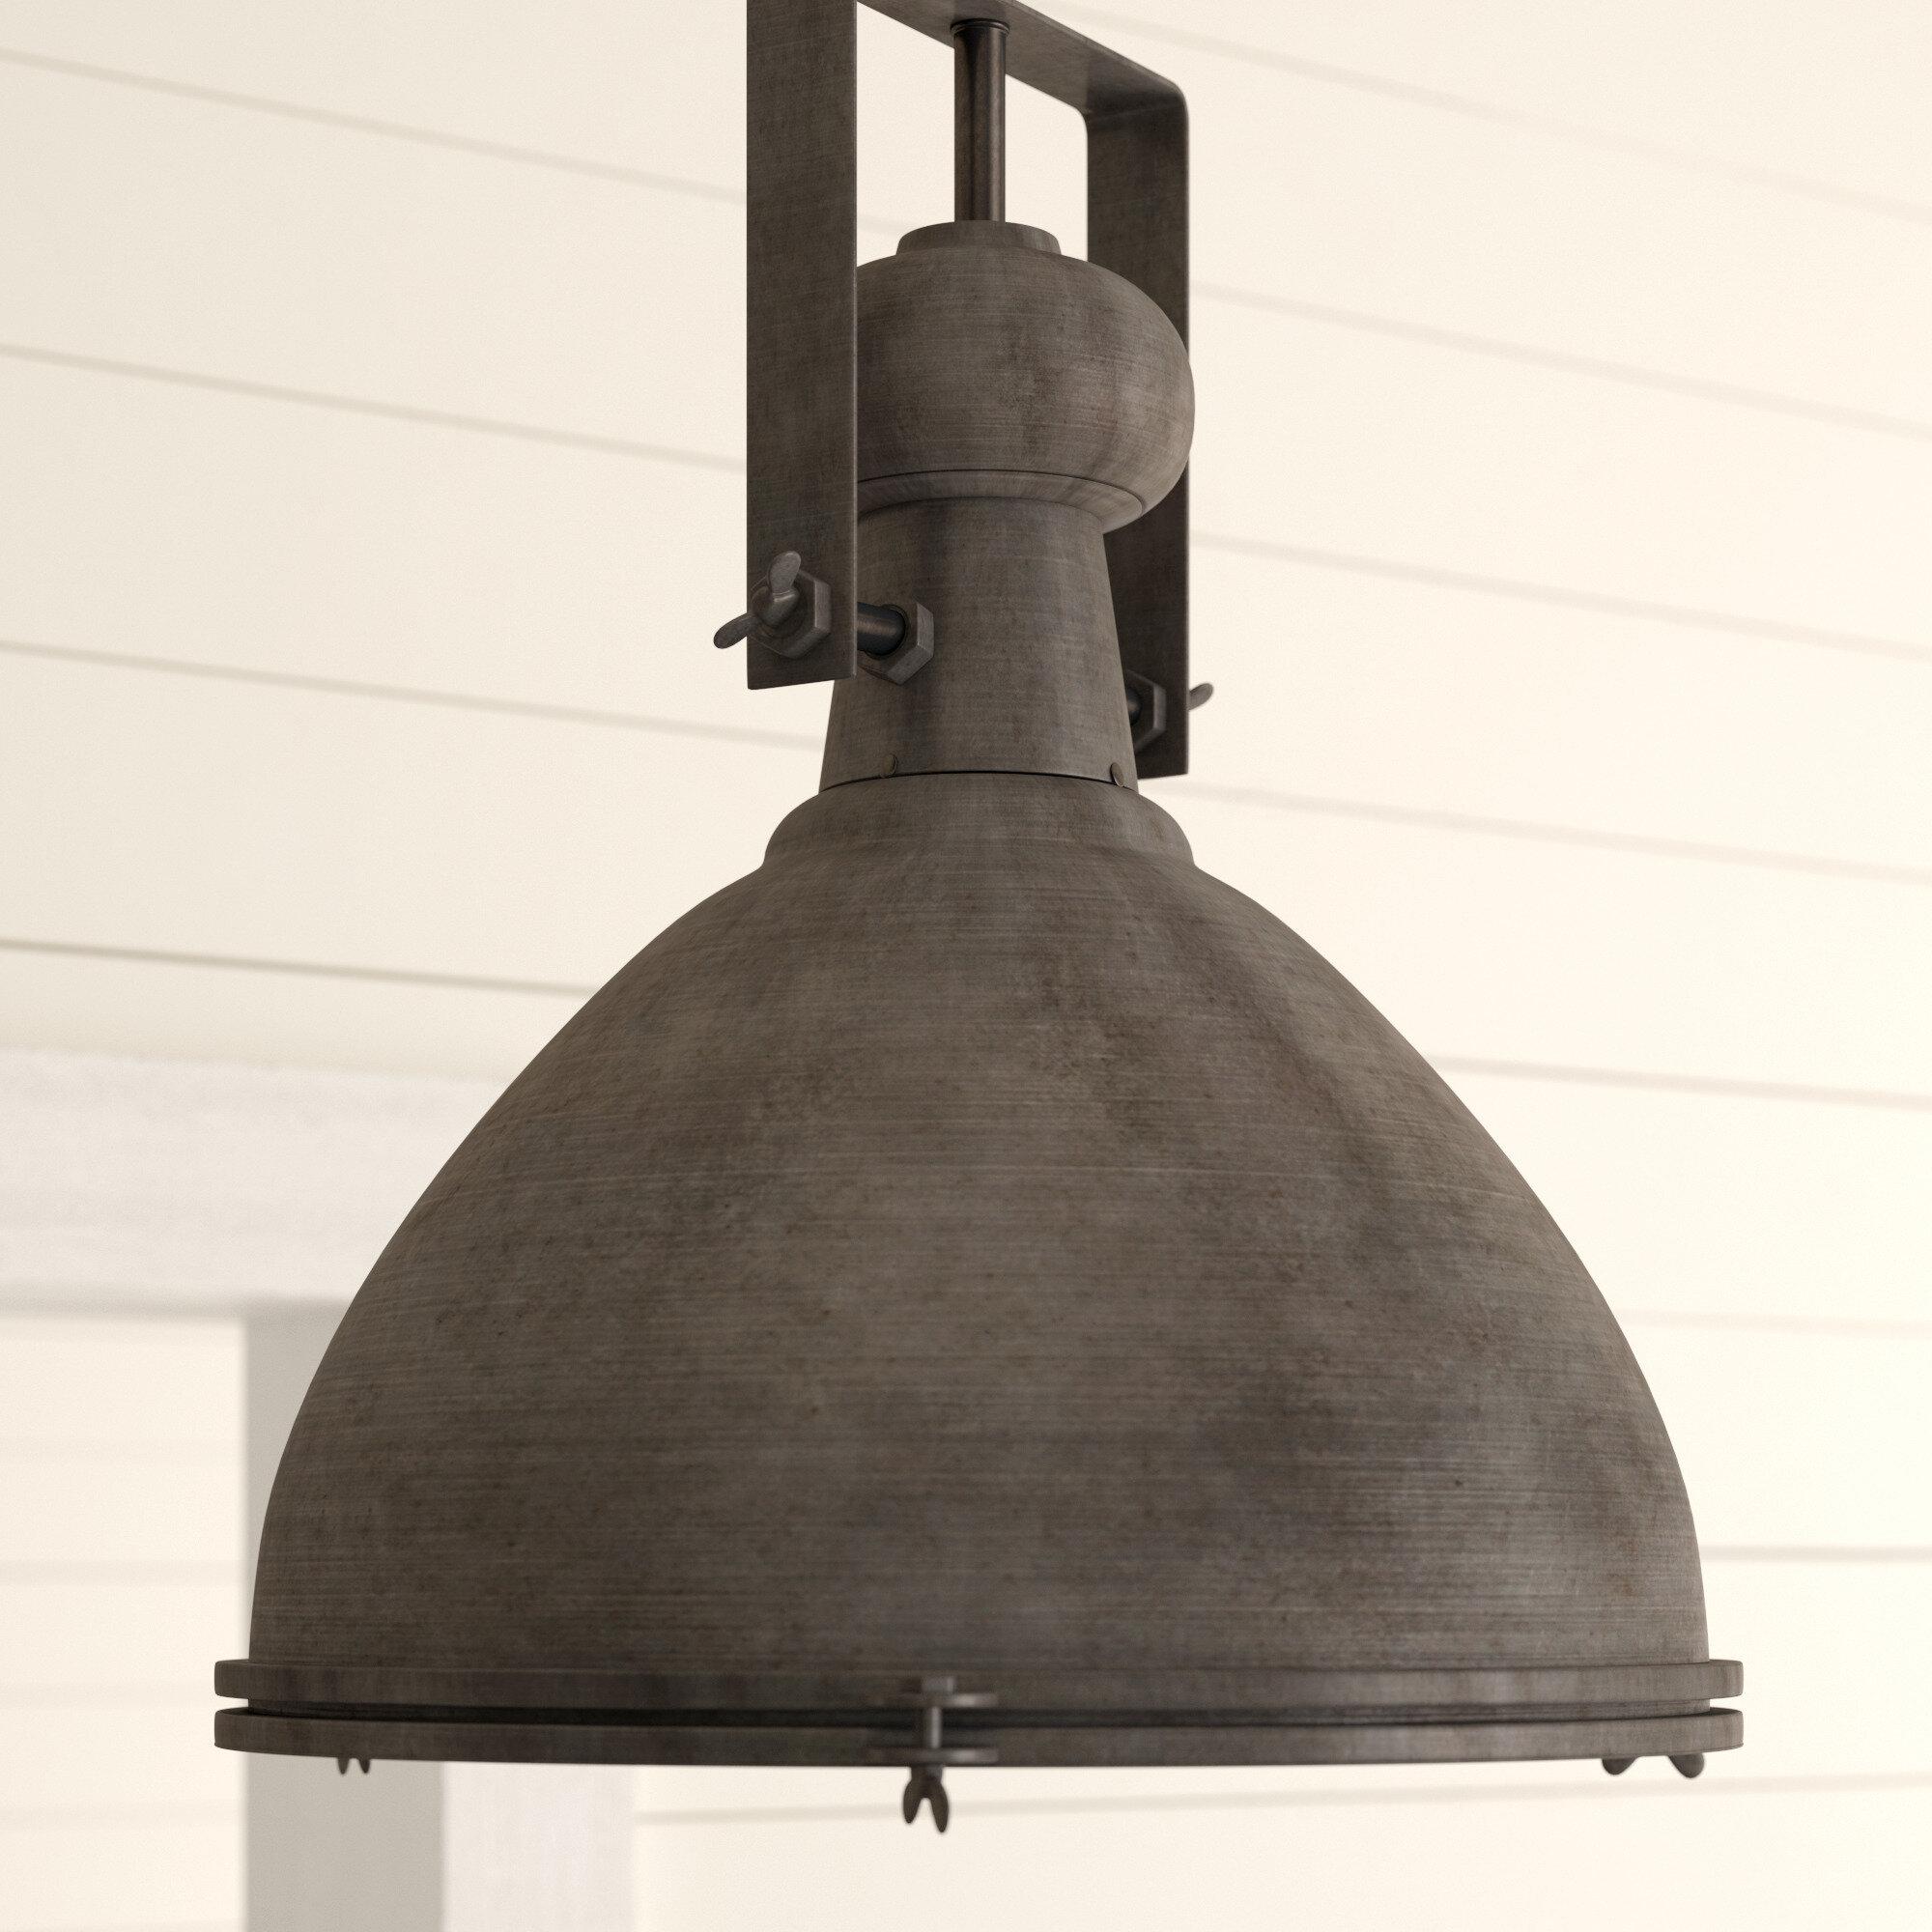 17 Stories Lavern 1-Light Single Dome Pendant regarding Macon 1-Light Single Dome Pendants (Image 4 of 30)